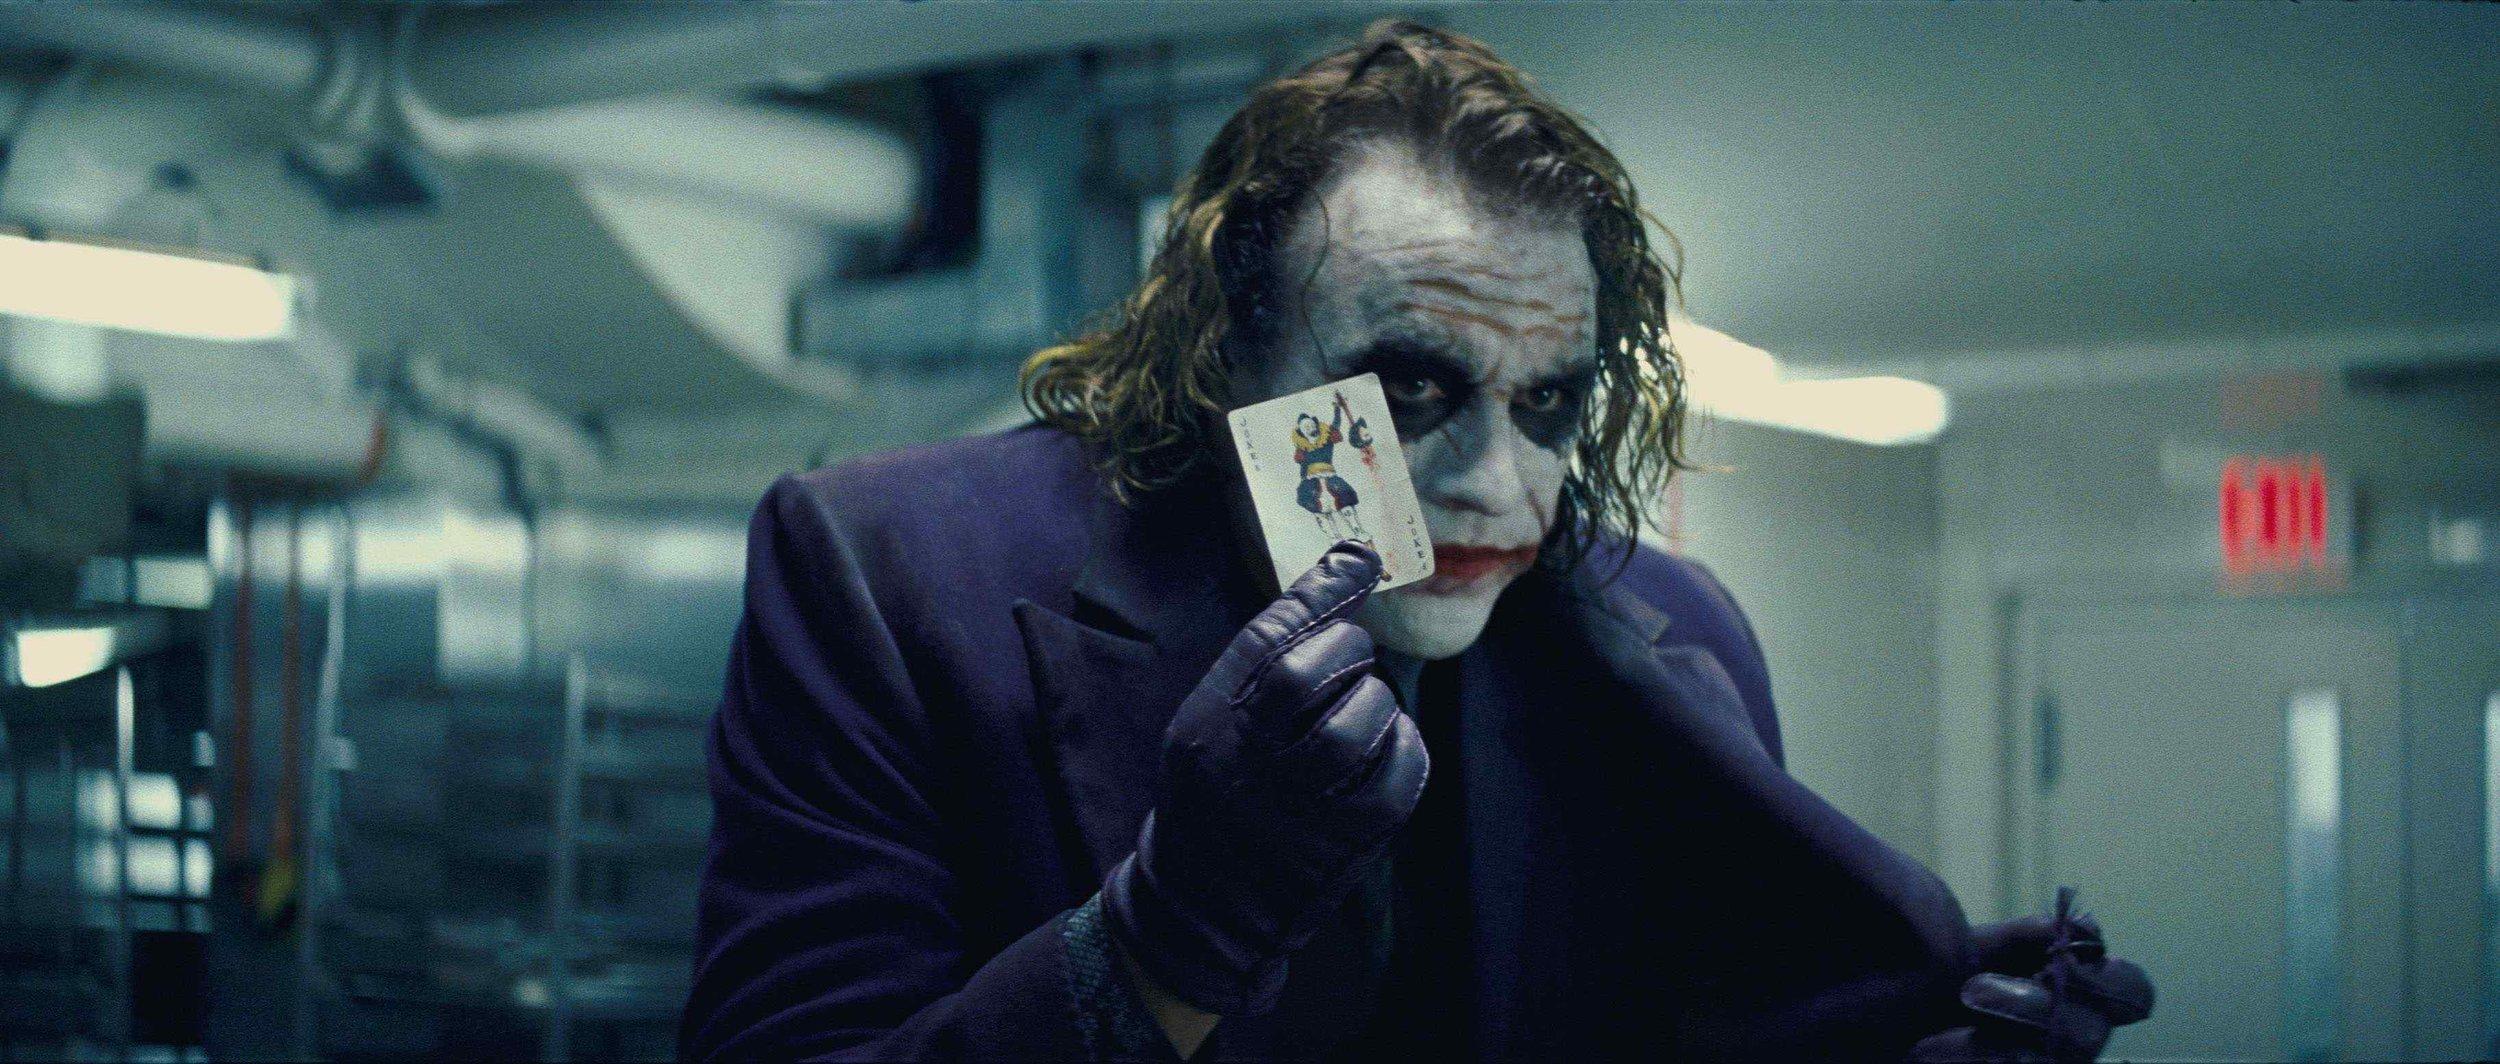 56. The Dark Knight